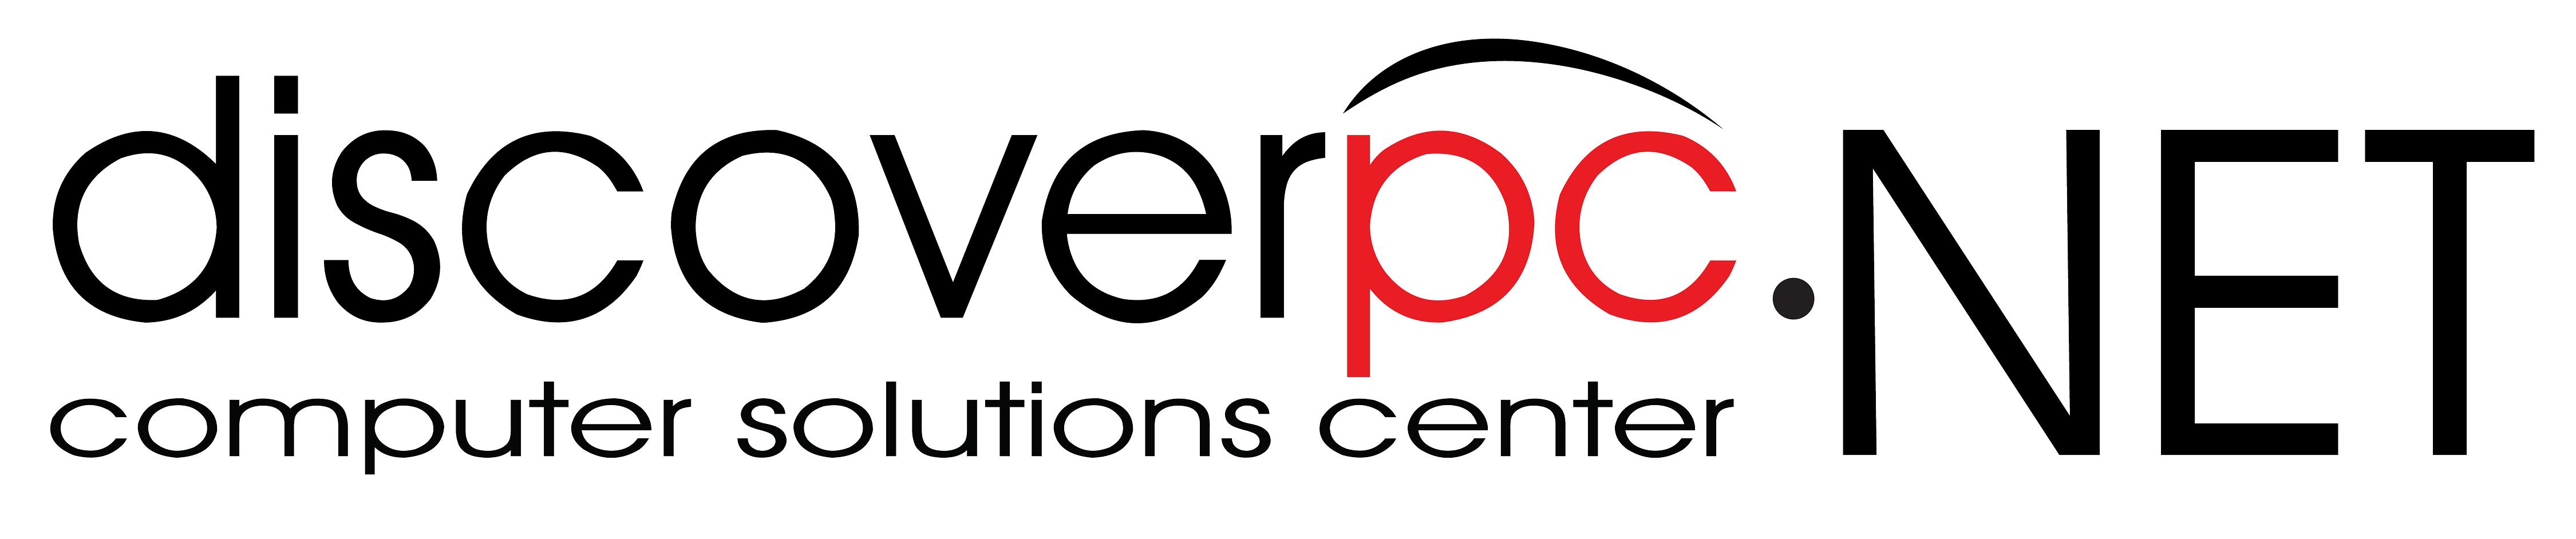 discoverpc.NET LLC